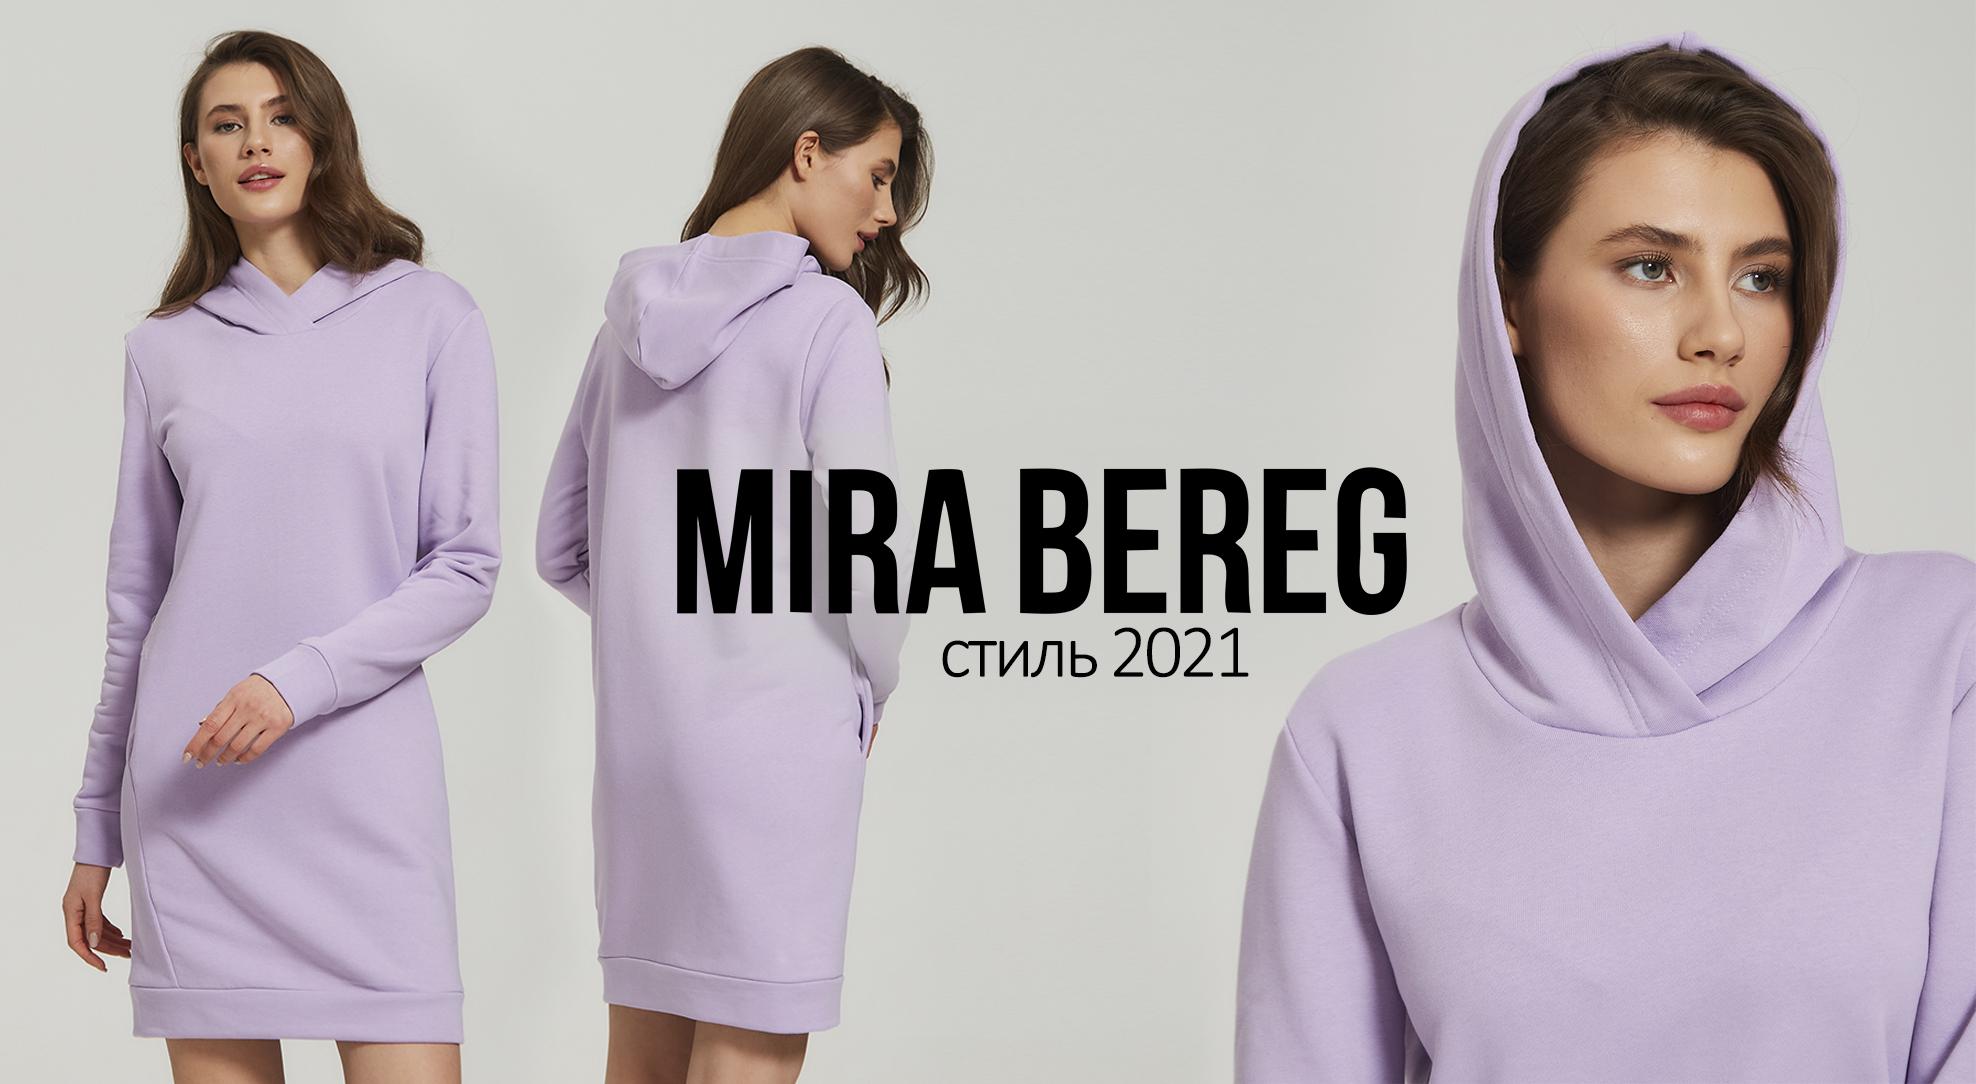 Мода 2021 года: платье-худи